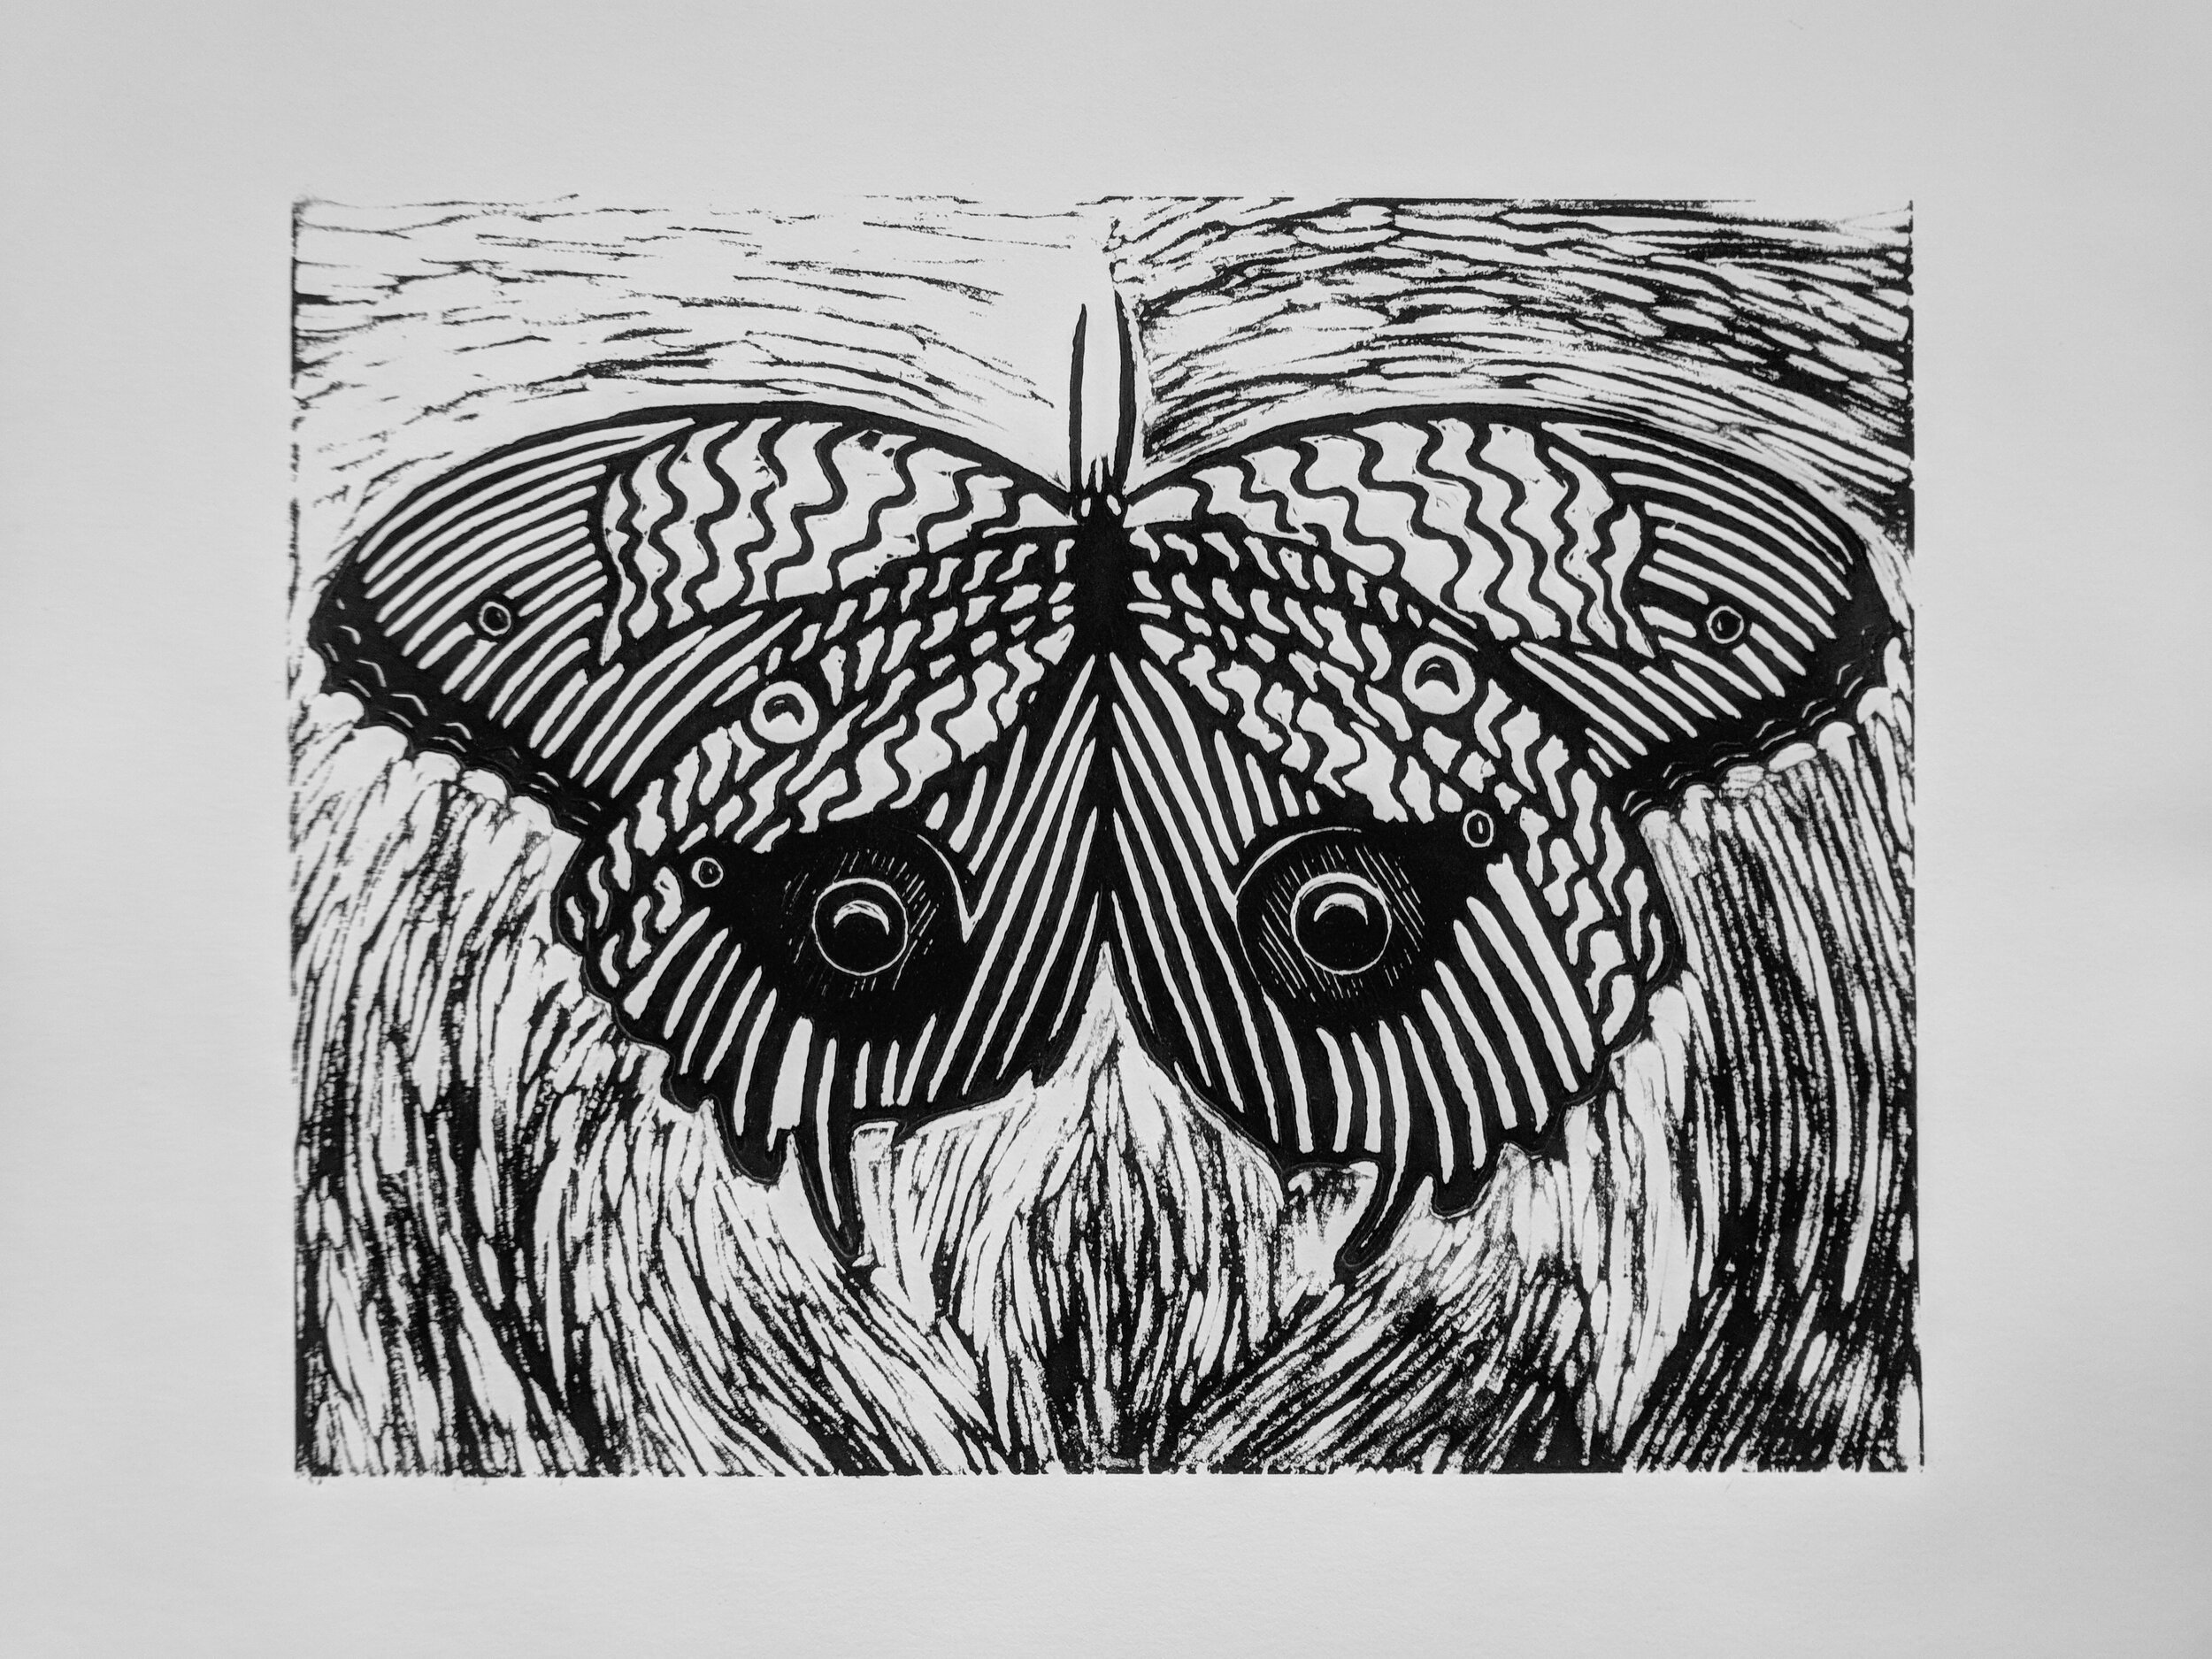 Owl_Eye_Moth (1).jpg